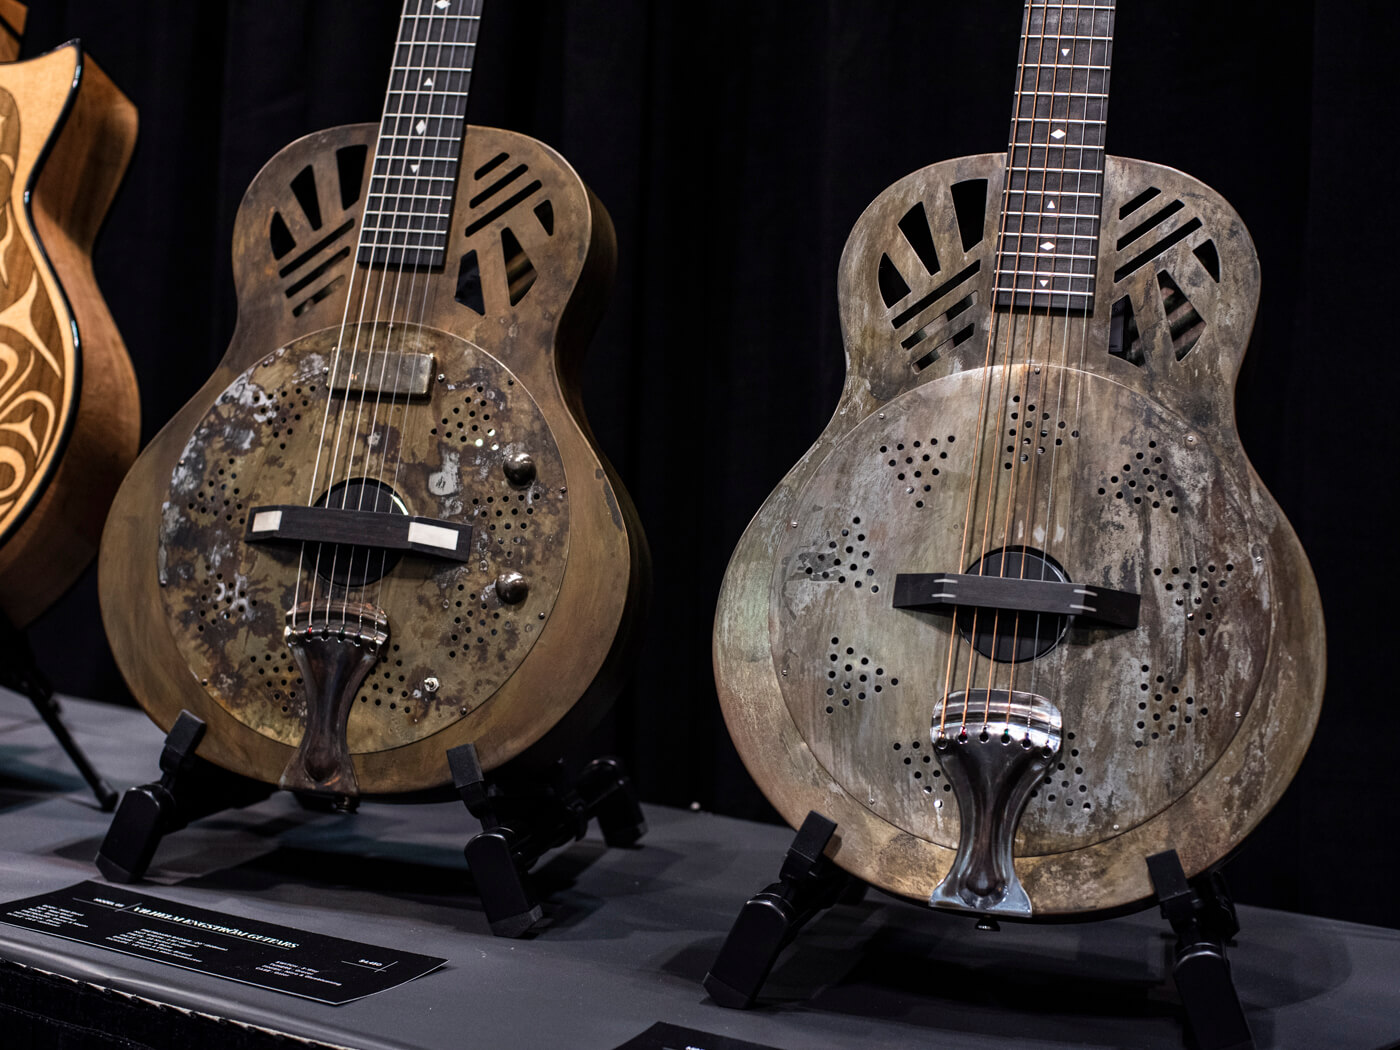 Vilhelm Engström Guitars